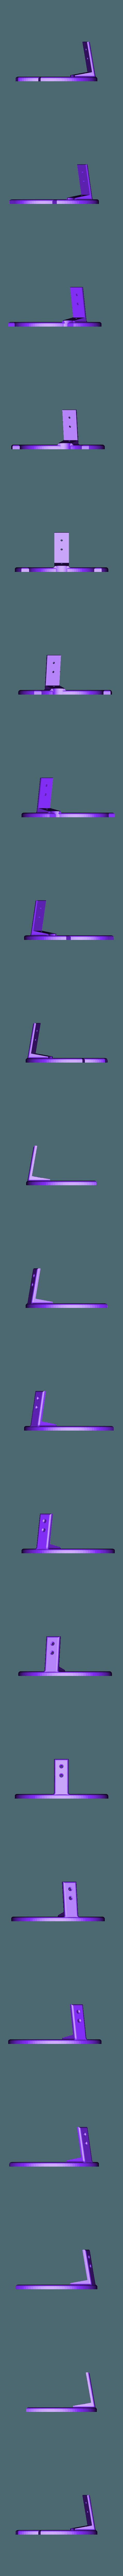 base.stl Download STL file clamp primer_painting miniature • 3D printer template, Stenoxp